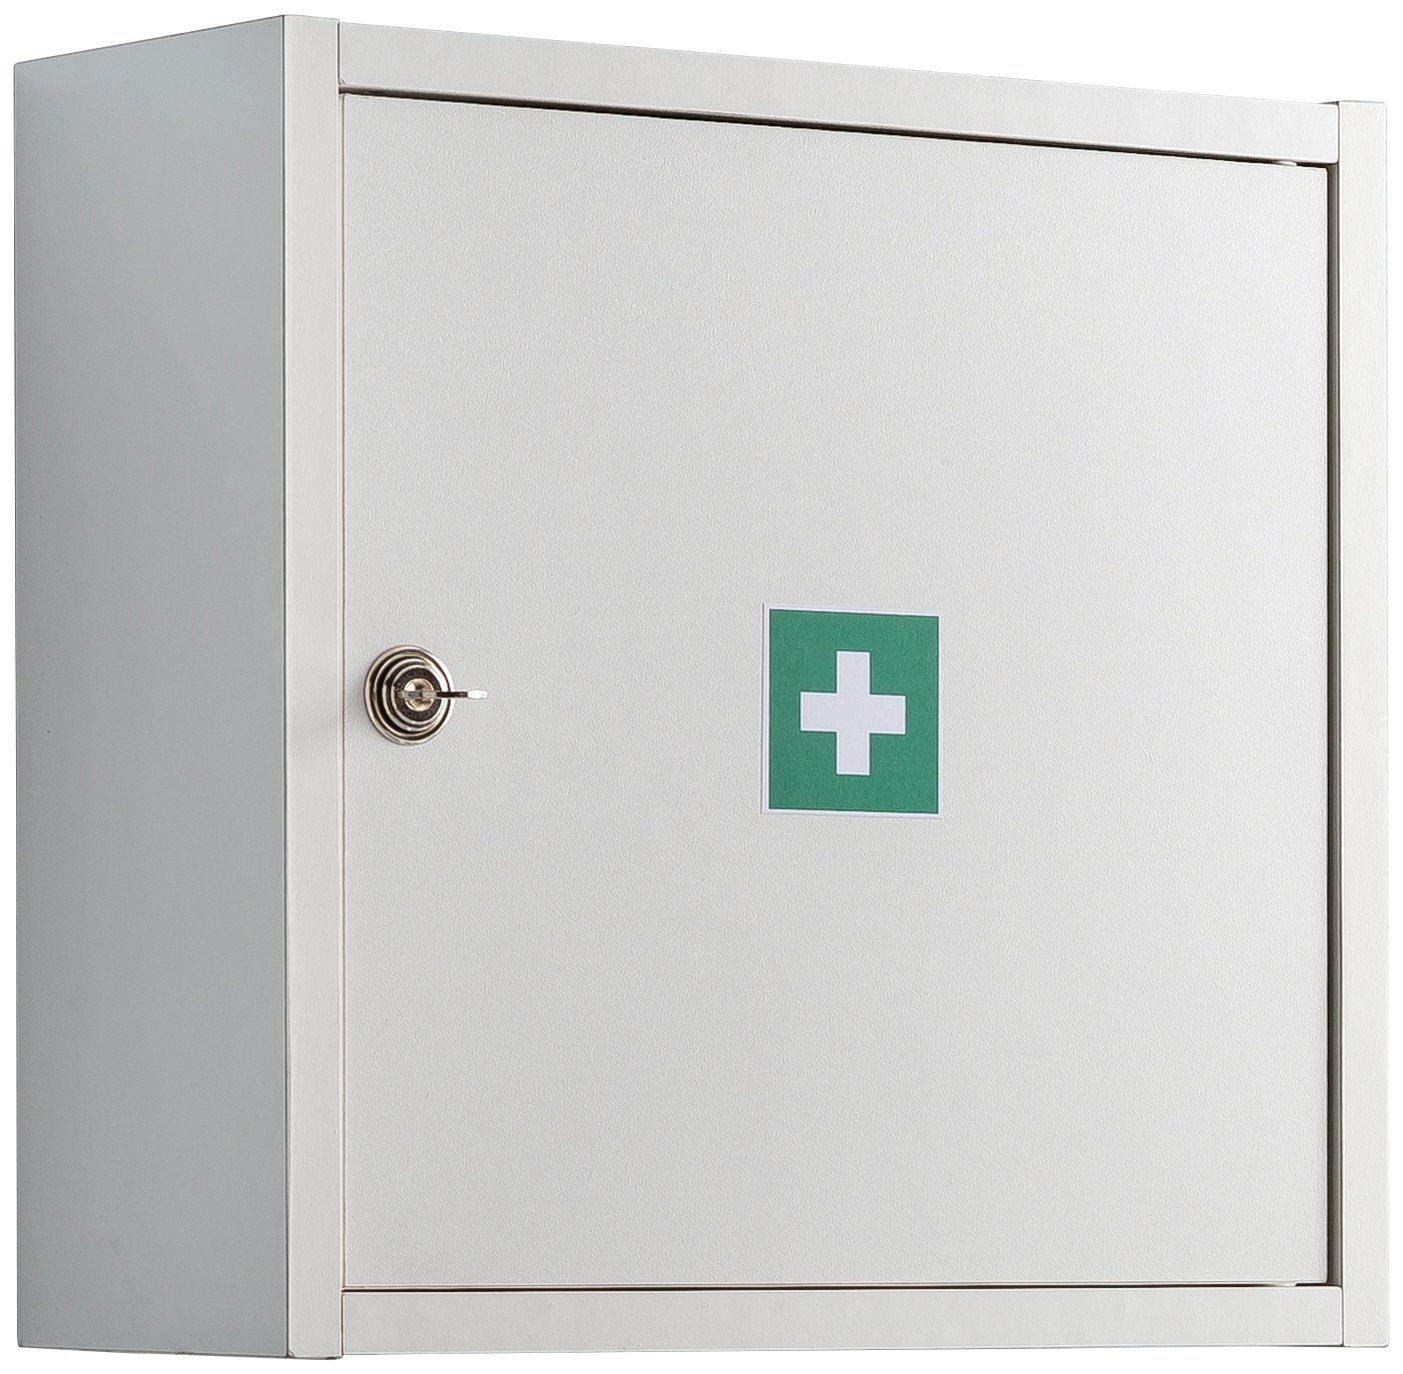 KESPER Medizinschrank , Breite 32,5 cm